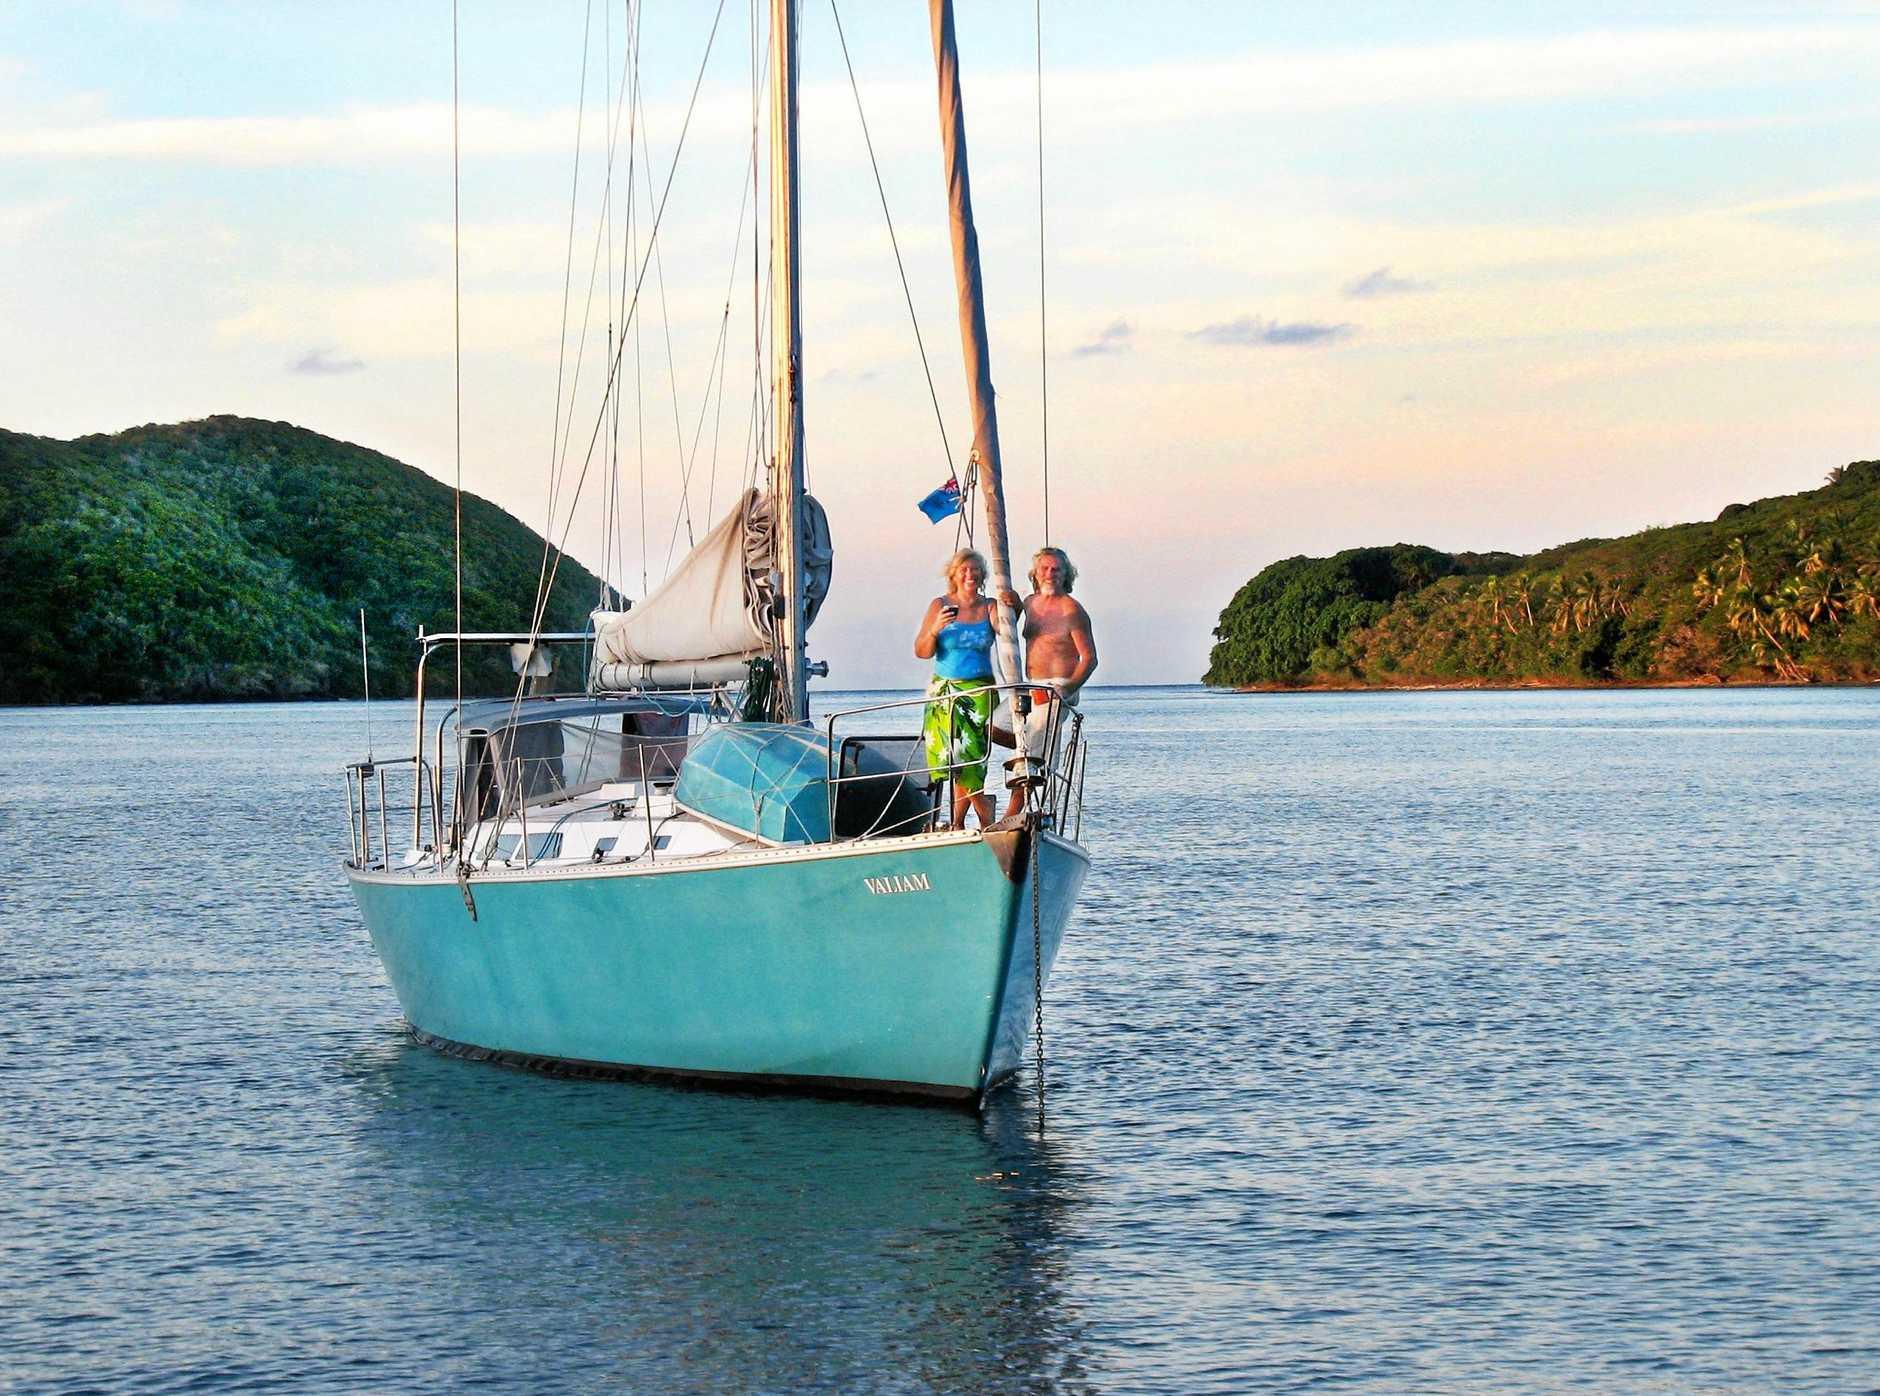 Linda and Bill Anderson on Valiam in Fiji.